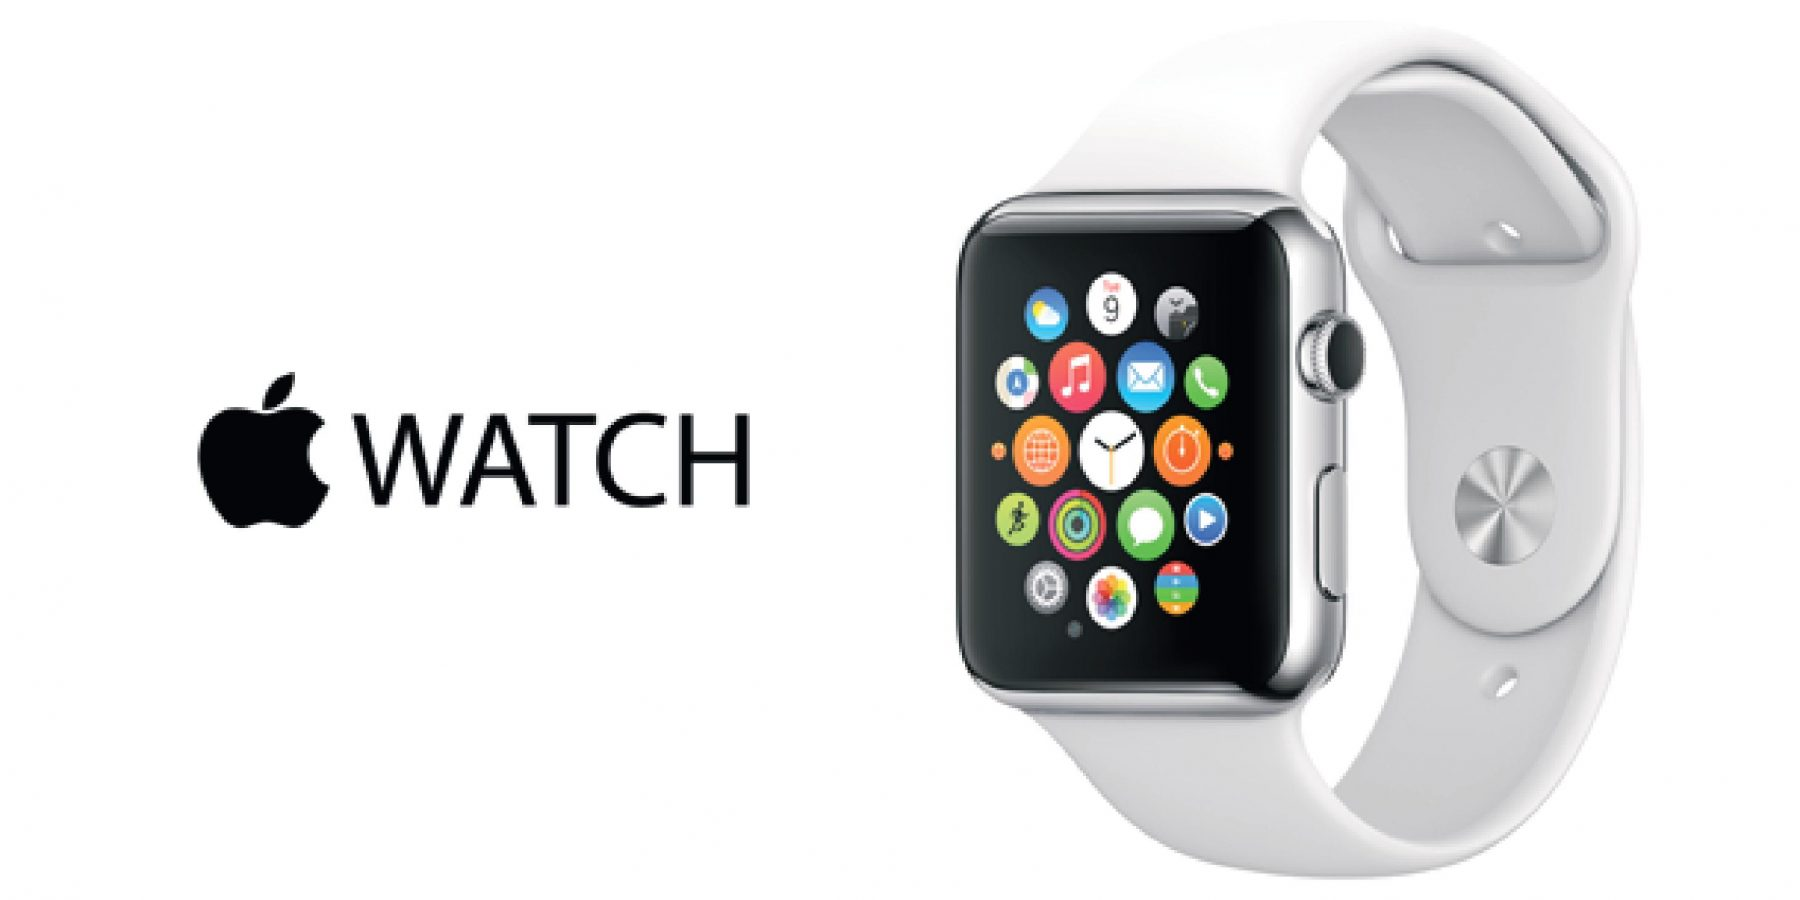 Apple Watch, Apple, heart sensor, health monitor